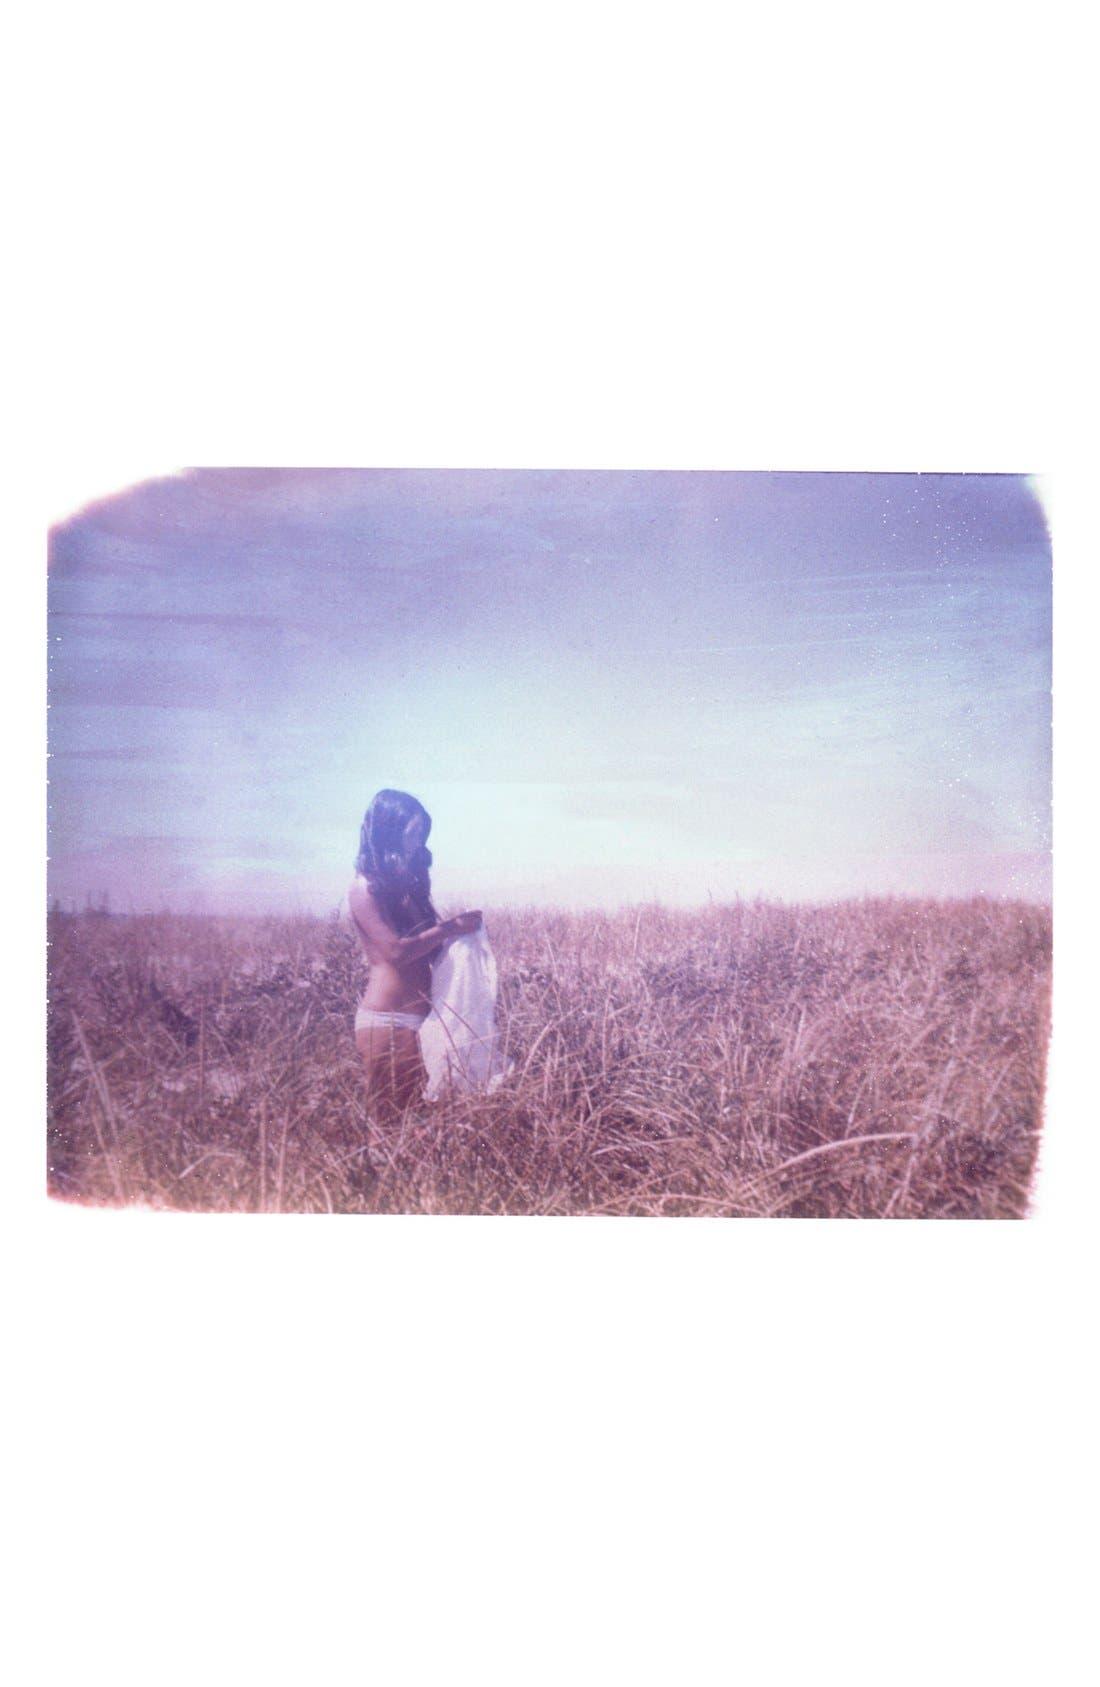 Main Image - She Hit Pause Studios 'Girl in Field' Wall Art